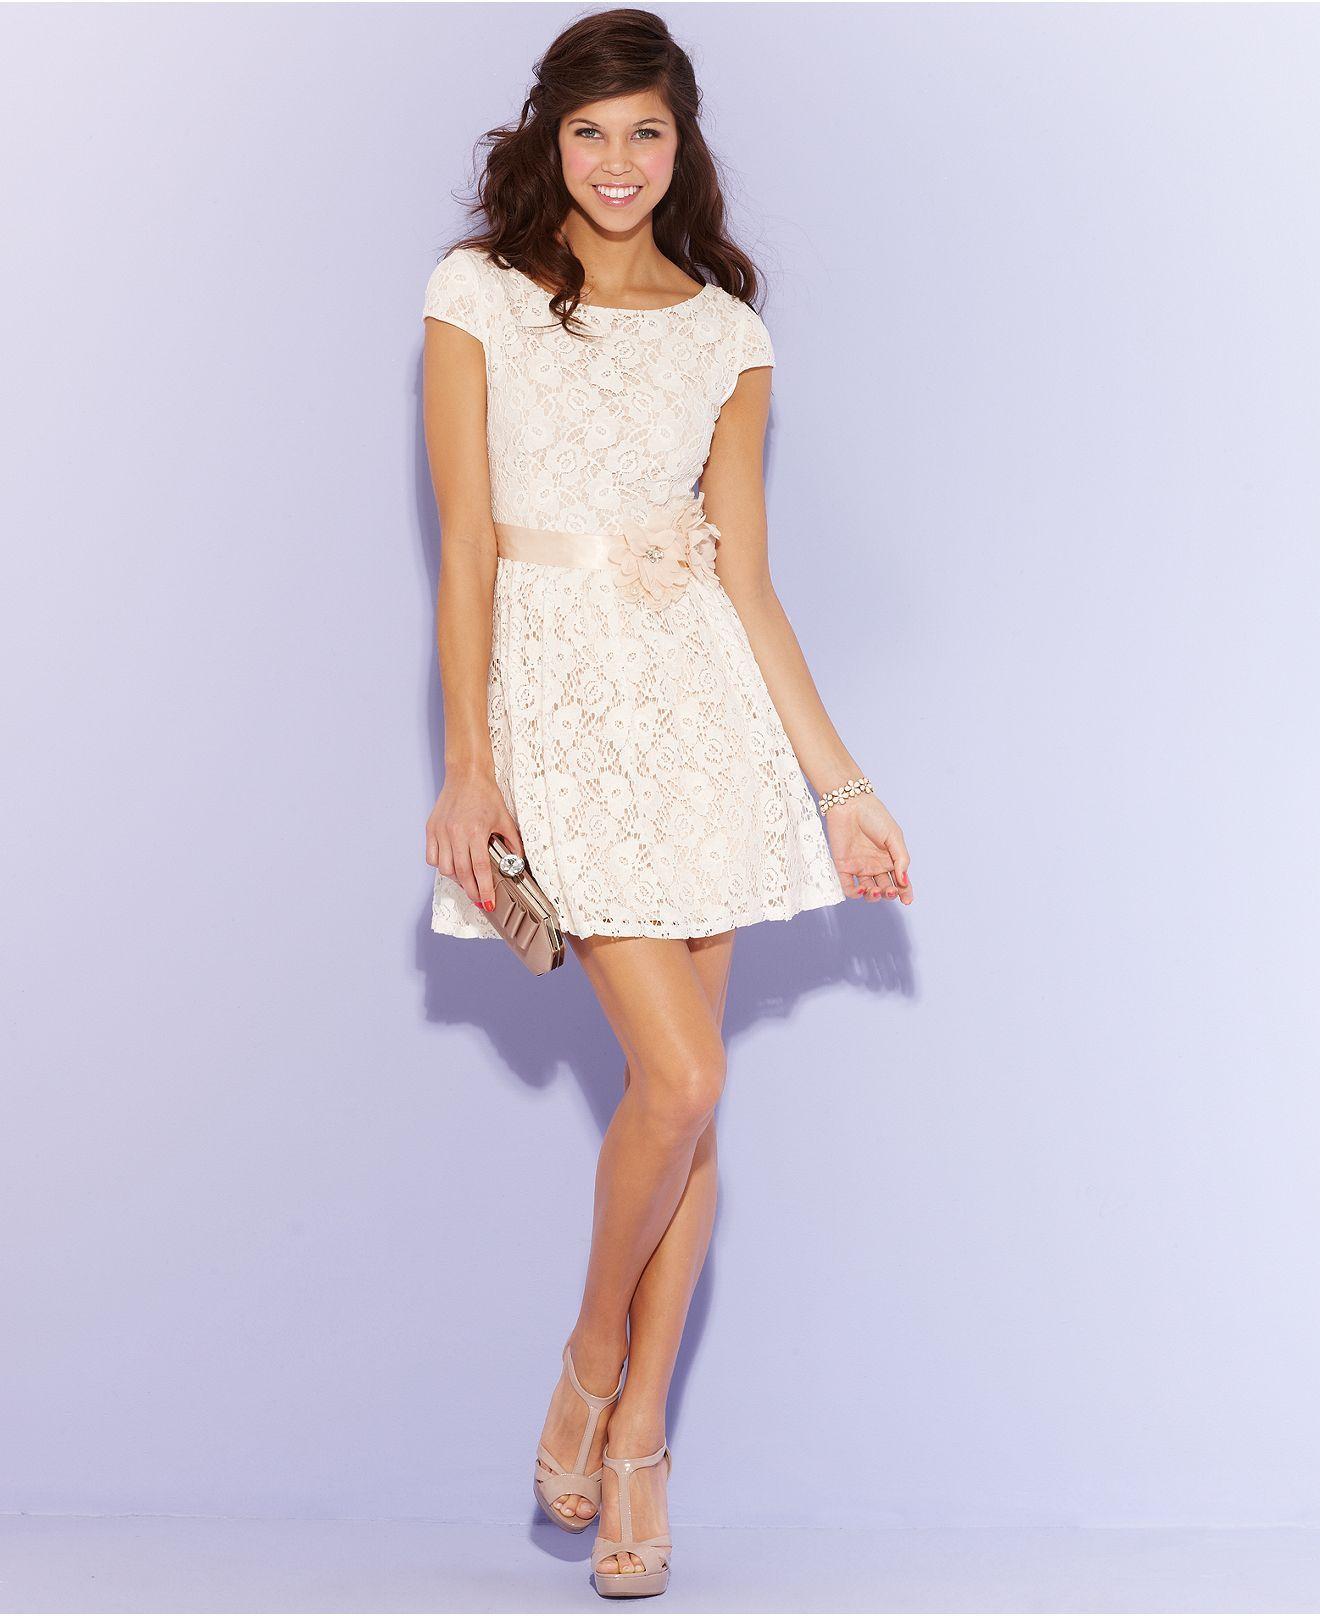 City Studios Juniors Dress, Cap Sleeve Belted Lace A-Line - Juniors Dresses - Macys Adorable $79